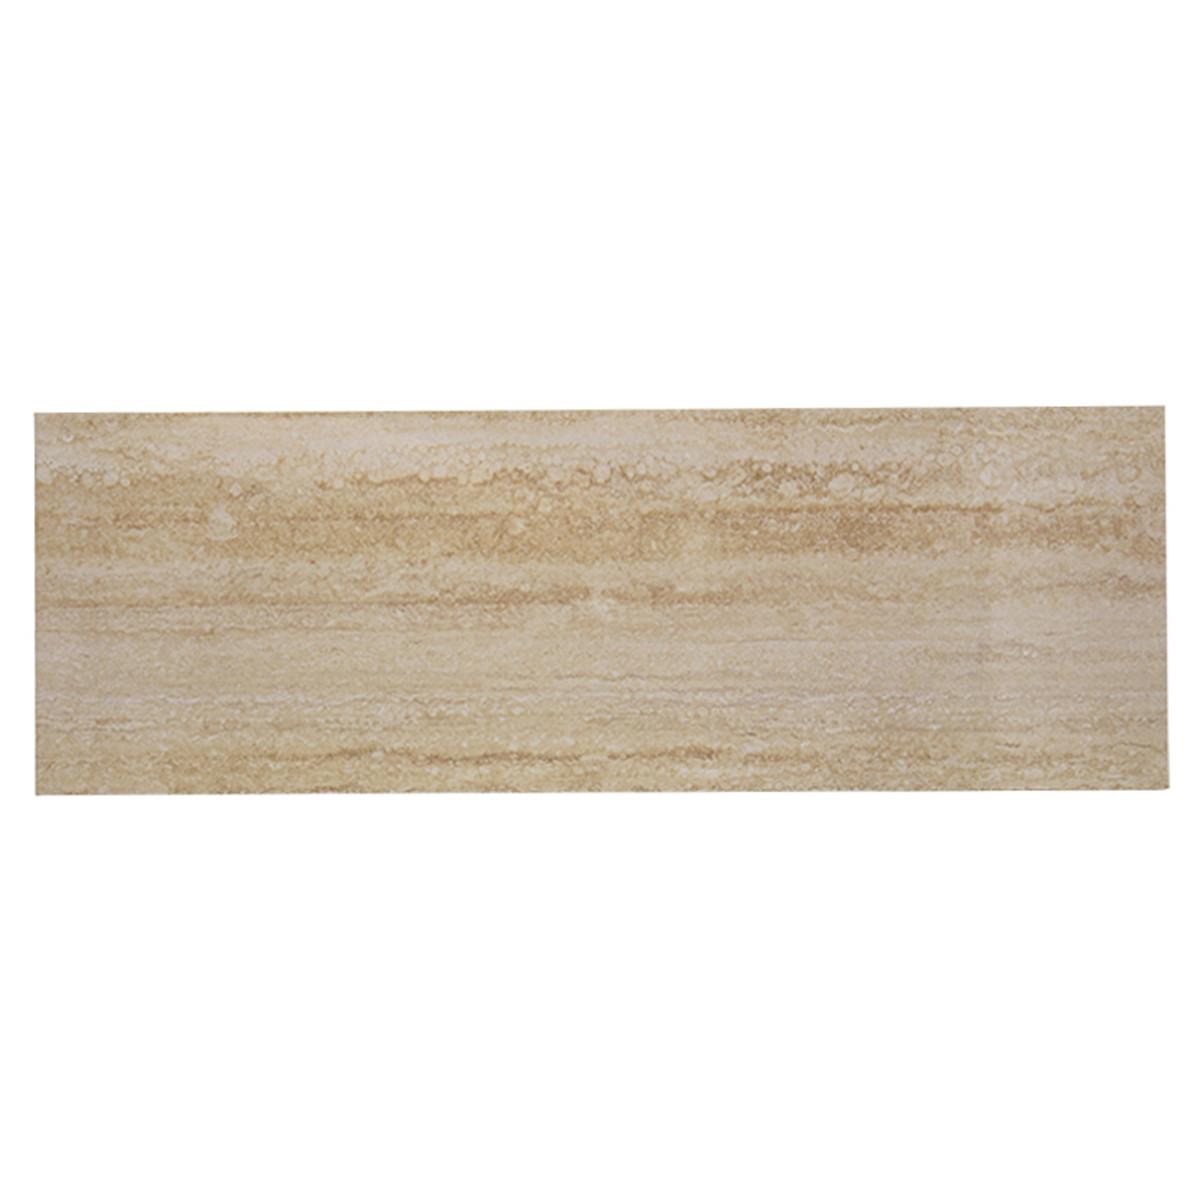 Плитка настенная Travertine 25х75 см 1.31 м2 цвет коричневый